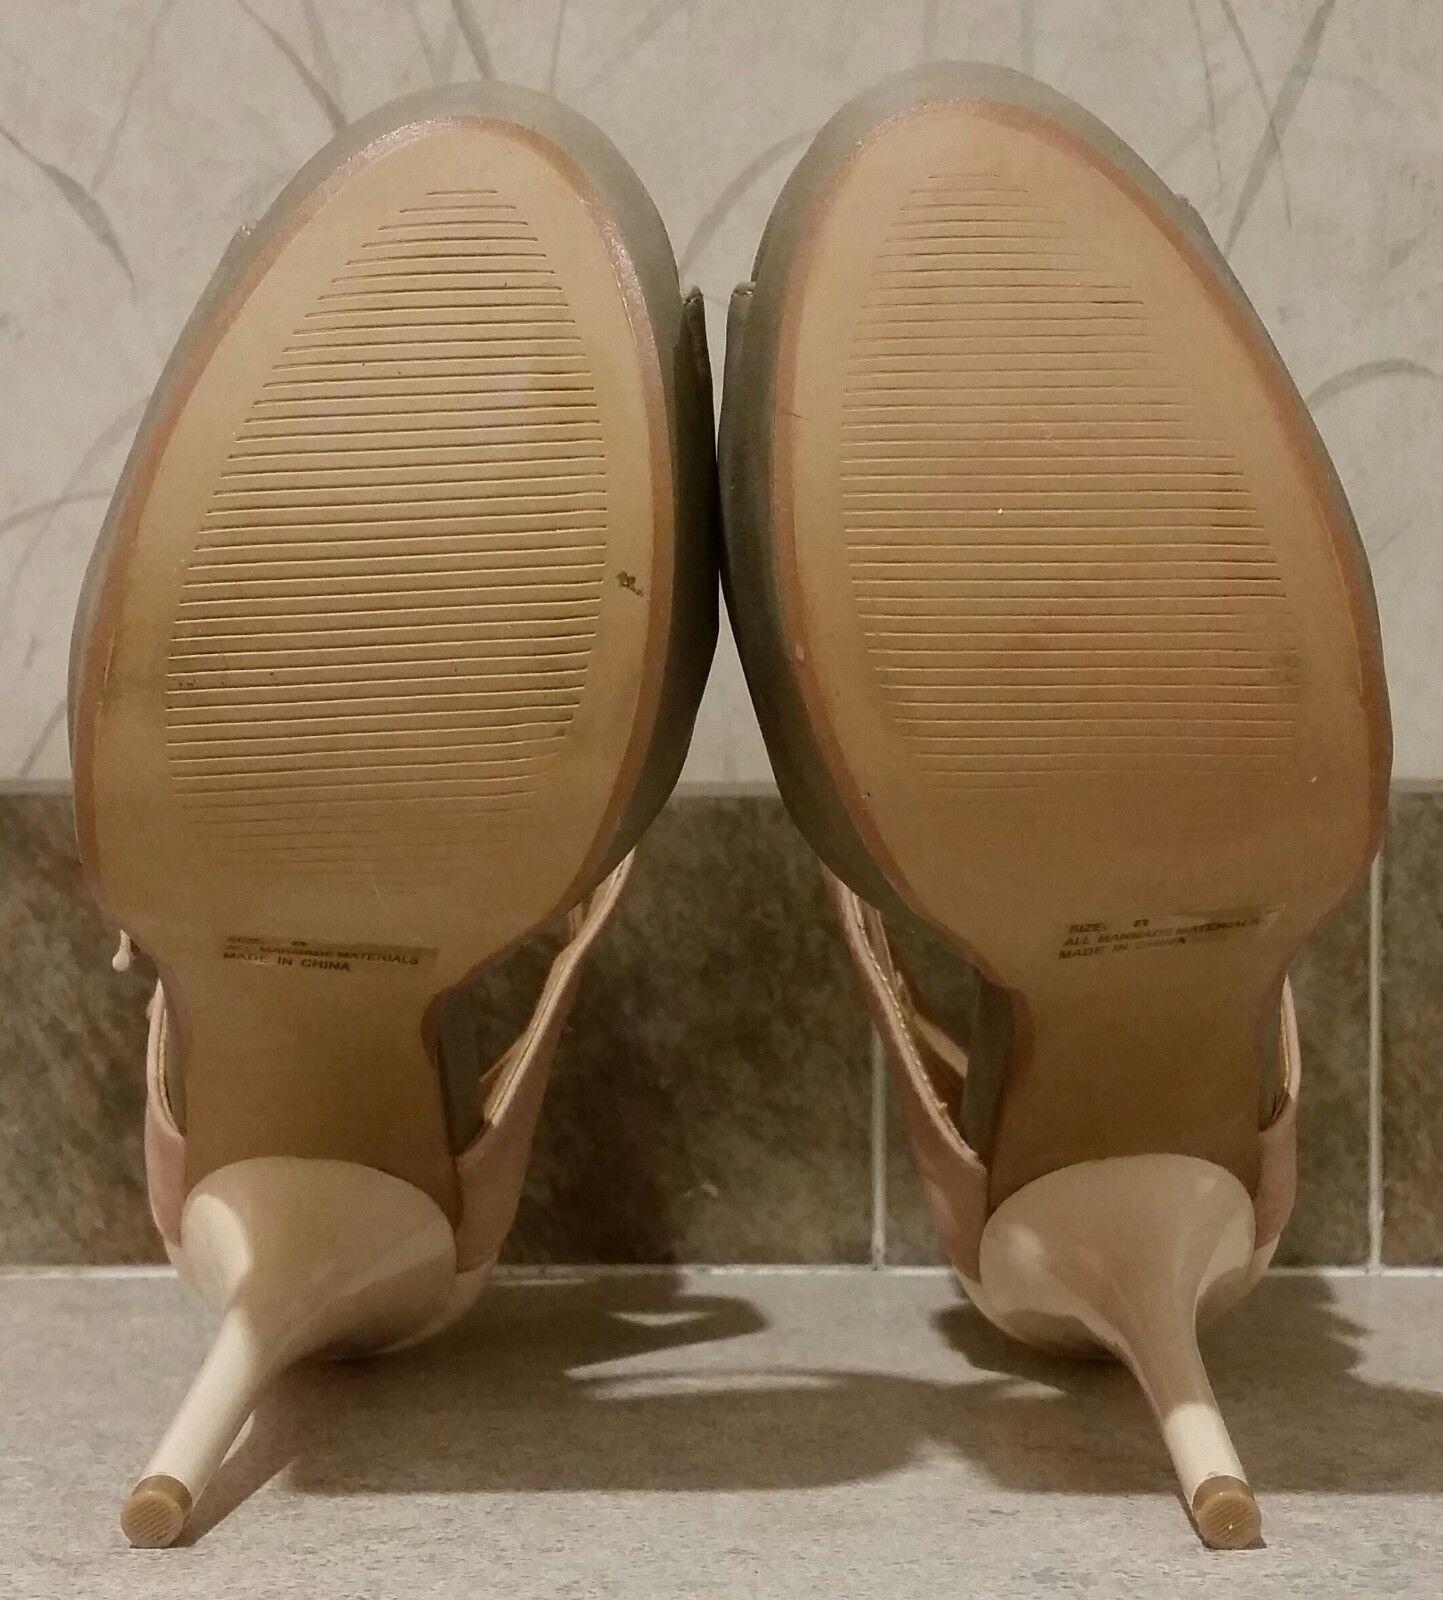 CHARLOTTE RUSSE Dazzling-73 grau Blaush Nude Nude Nude Strap Platform Stiletto Sandals 8 d6cb39